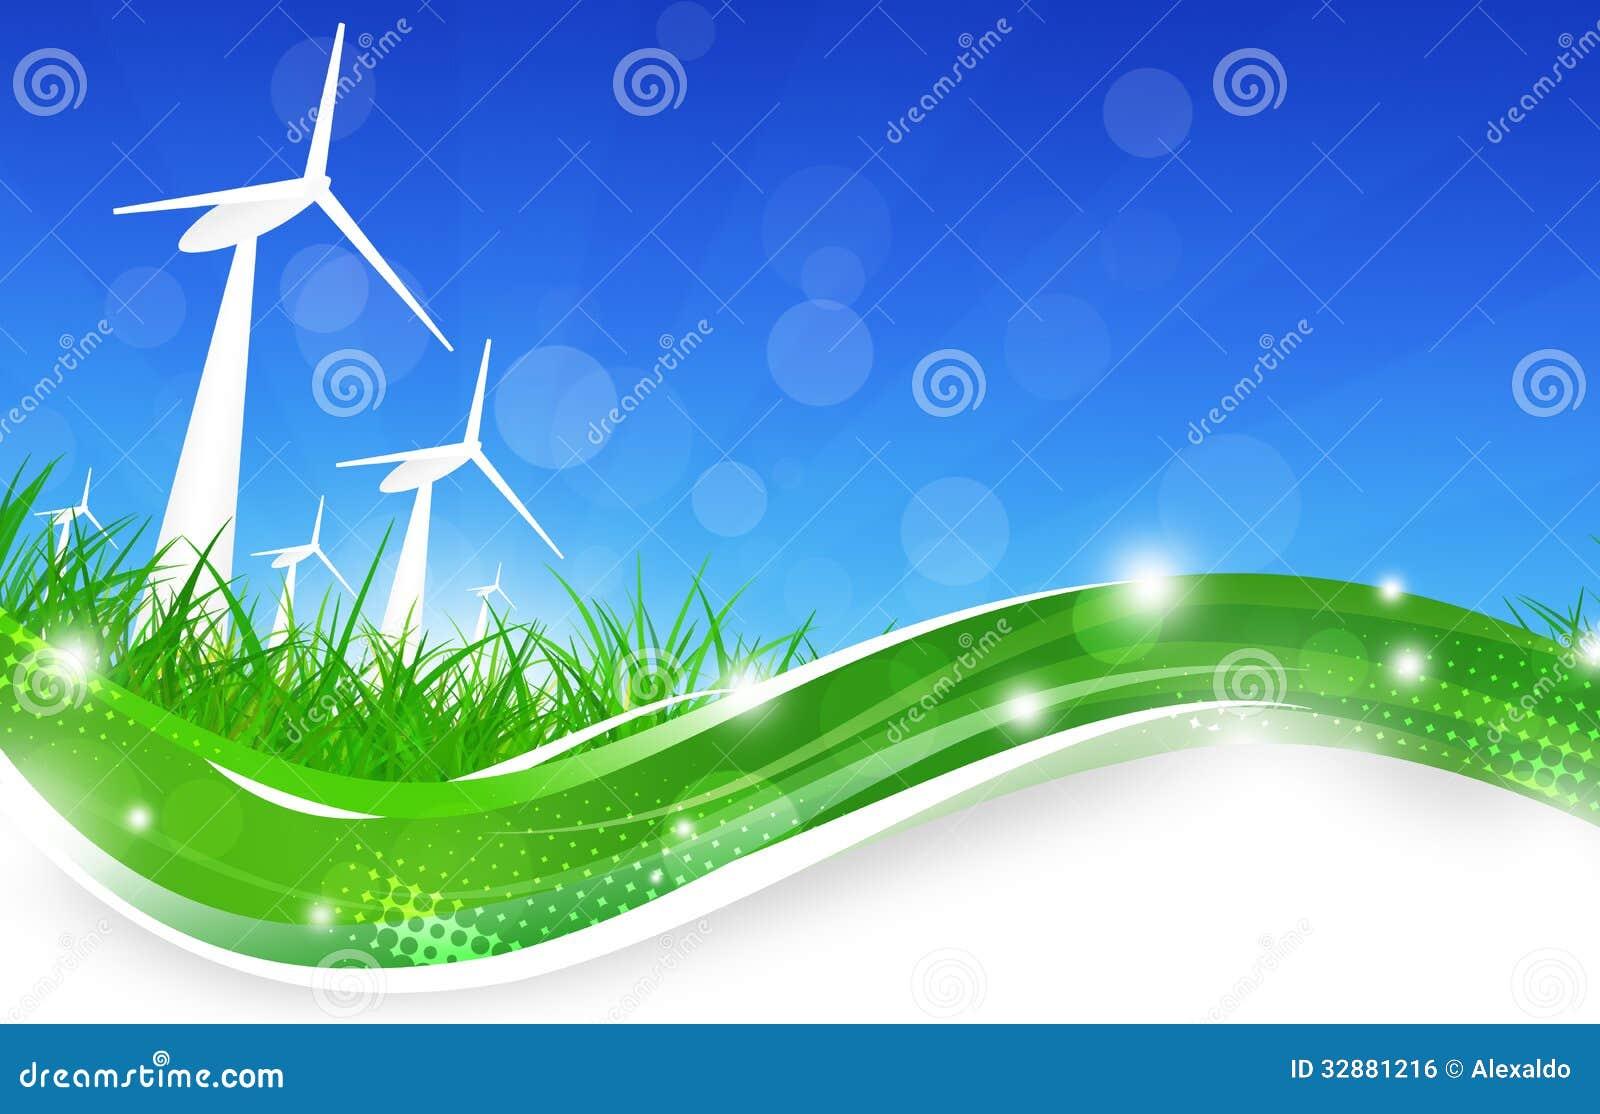 is wind power green Modern windmill turbine, wind power, green energy photo about rotate, wisconsinart, pollutant, health, modern, environmentally, clean, blade, renewable, power, blades - 16516892.